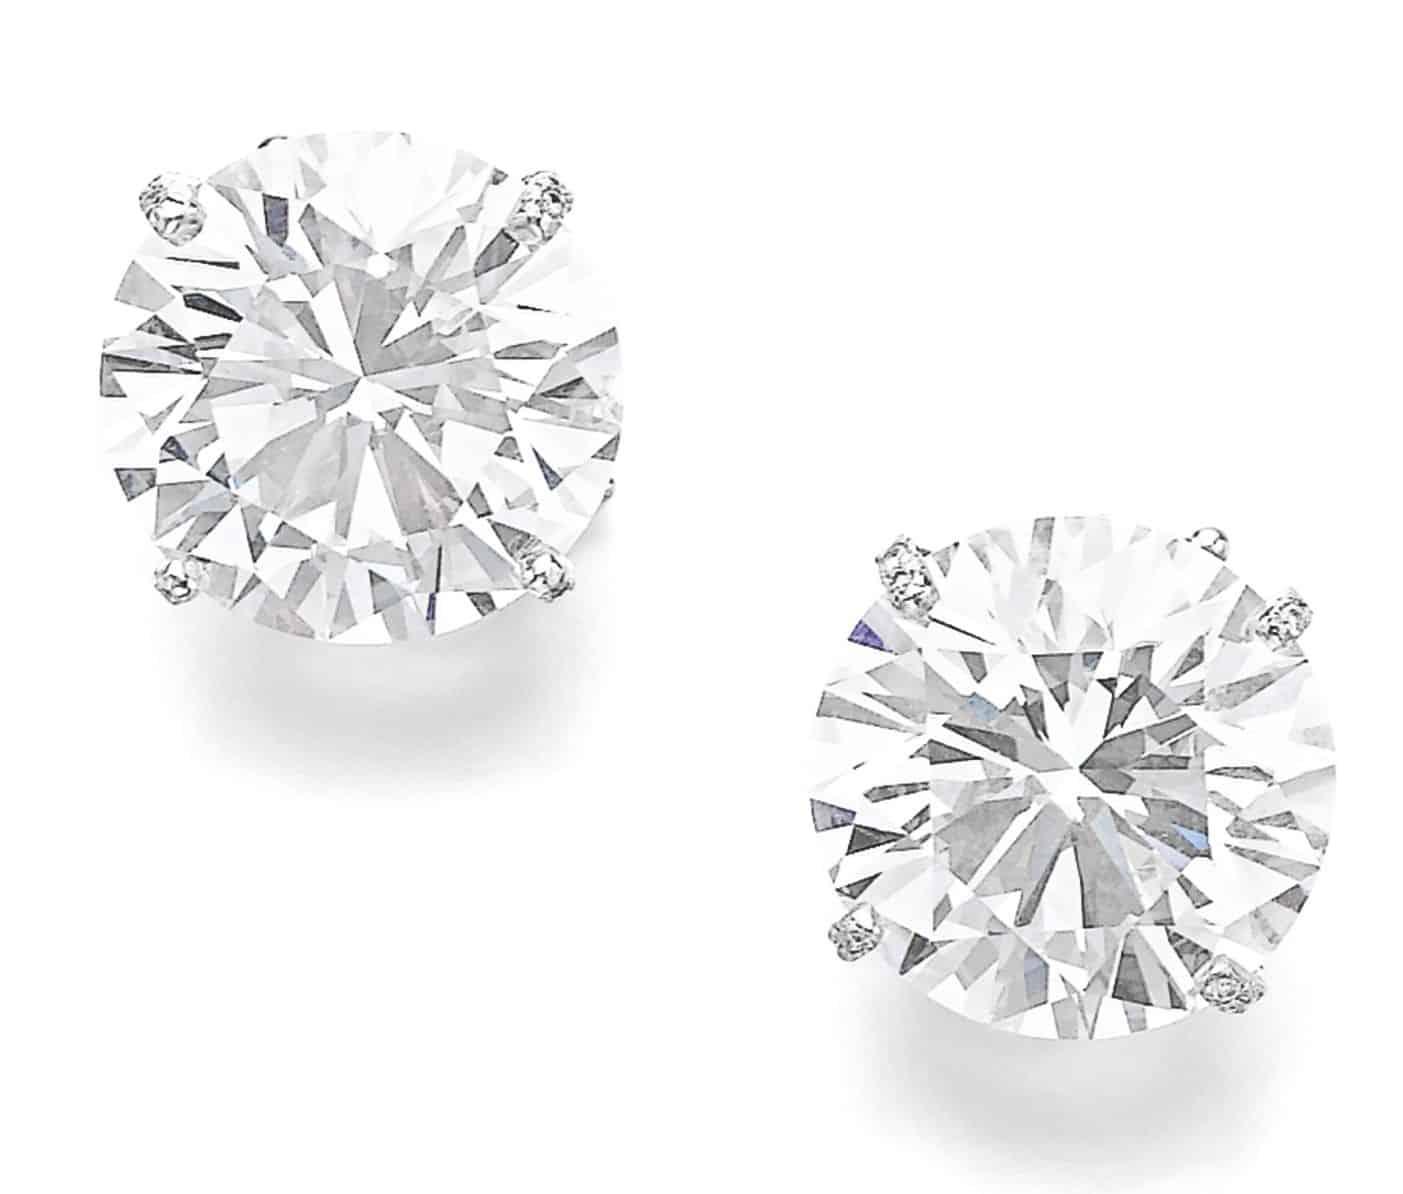 LOT 302 - PAIR OF ATTRACTIVE DIAMOND EARRINGS